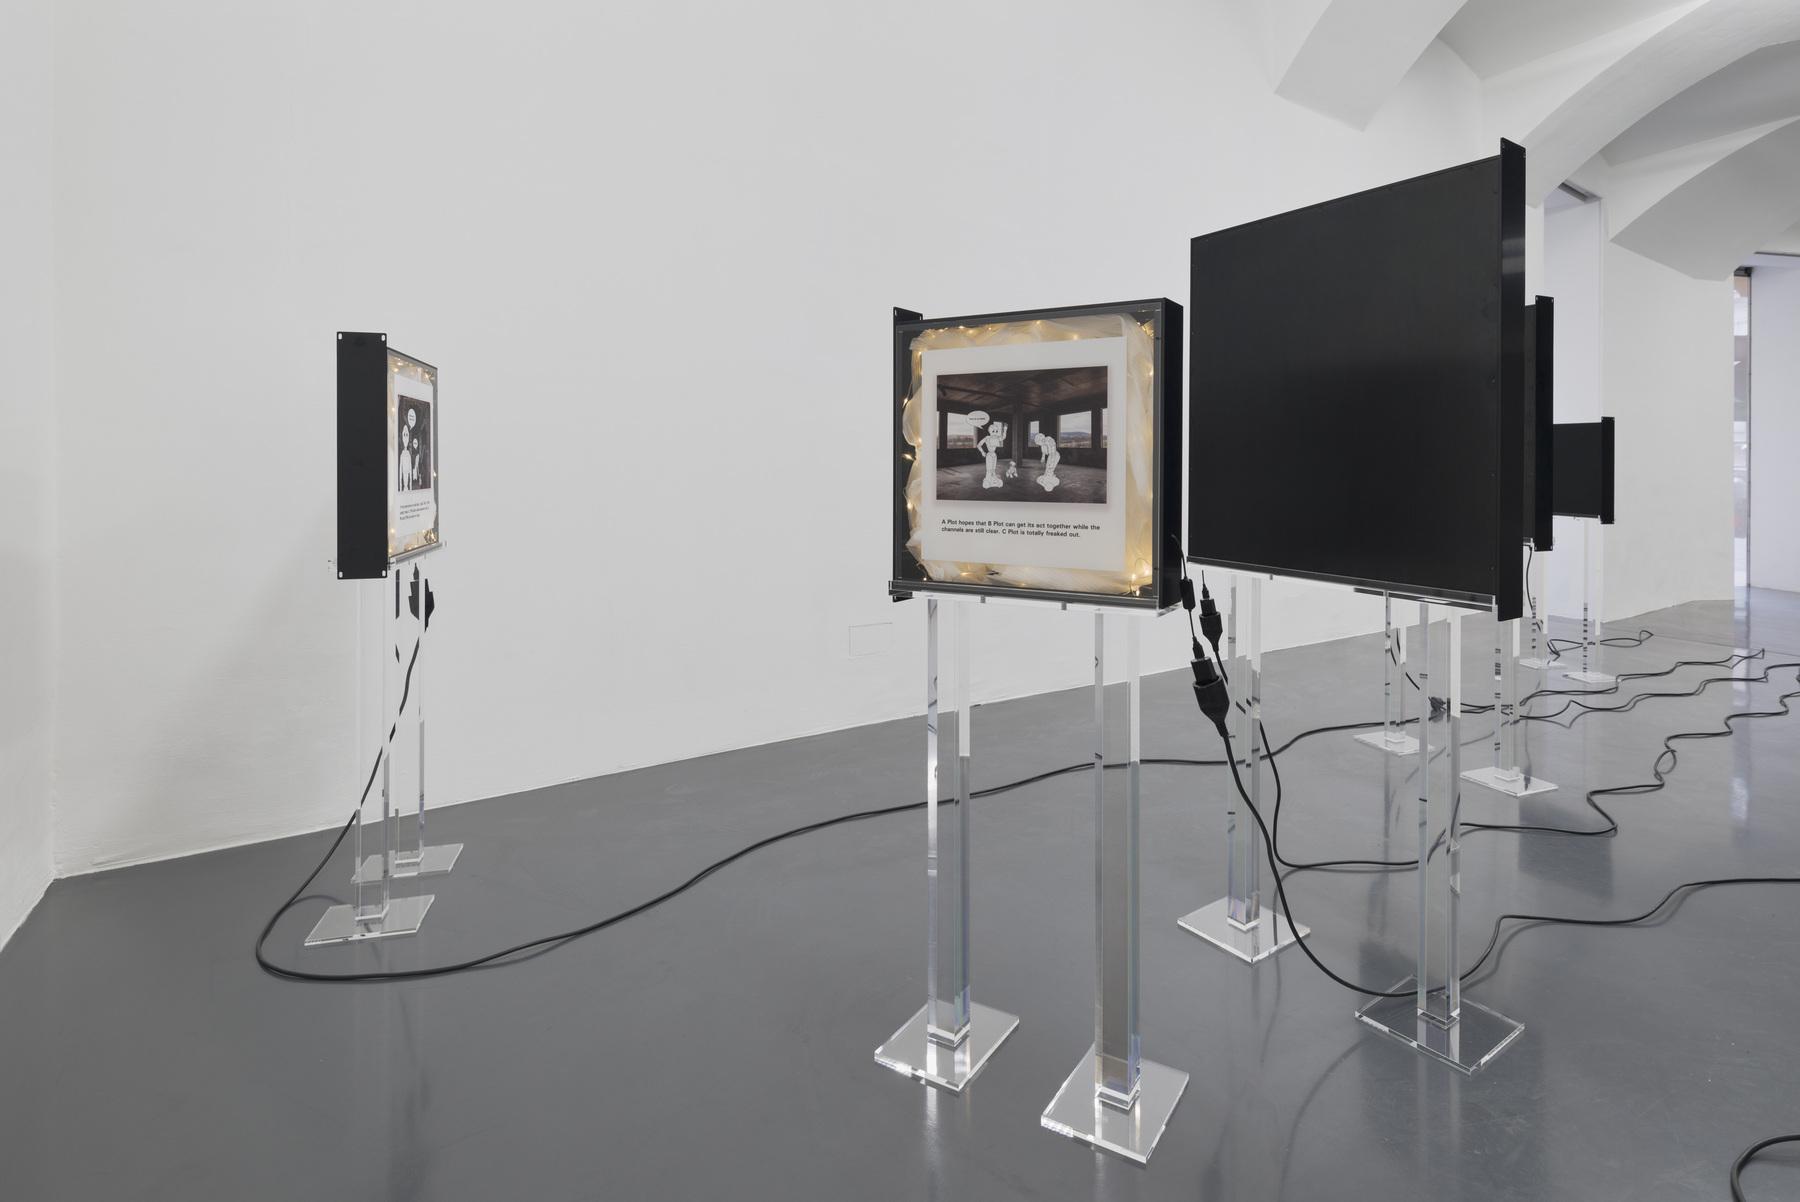 24_Cécile B. Evans_Galerie Emanuel Layr Vienna